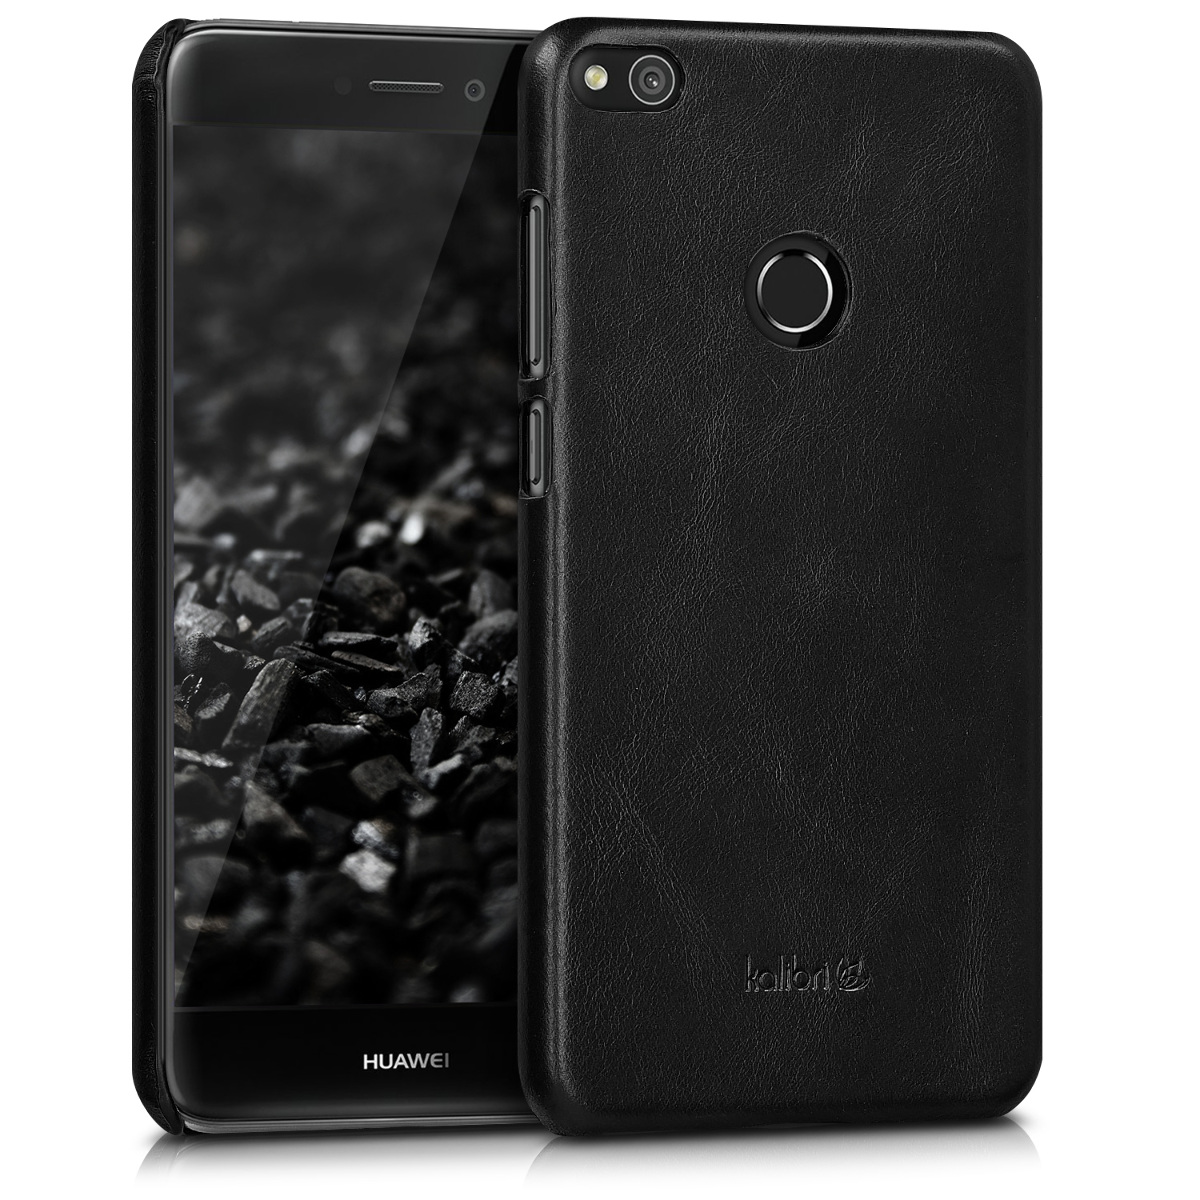 Kalibri Σκληρή Δερμάτινη Θήκη Huawei P8 / P9 Lite 2017 - Black (42246.01)